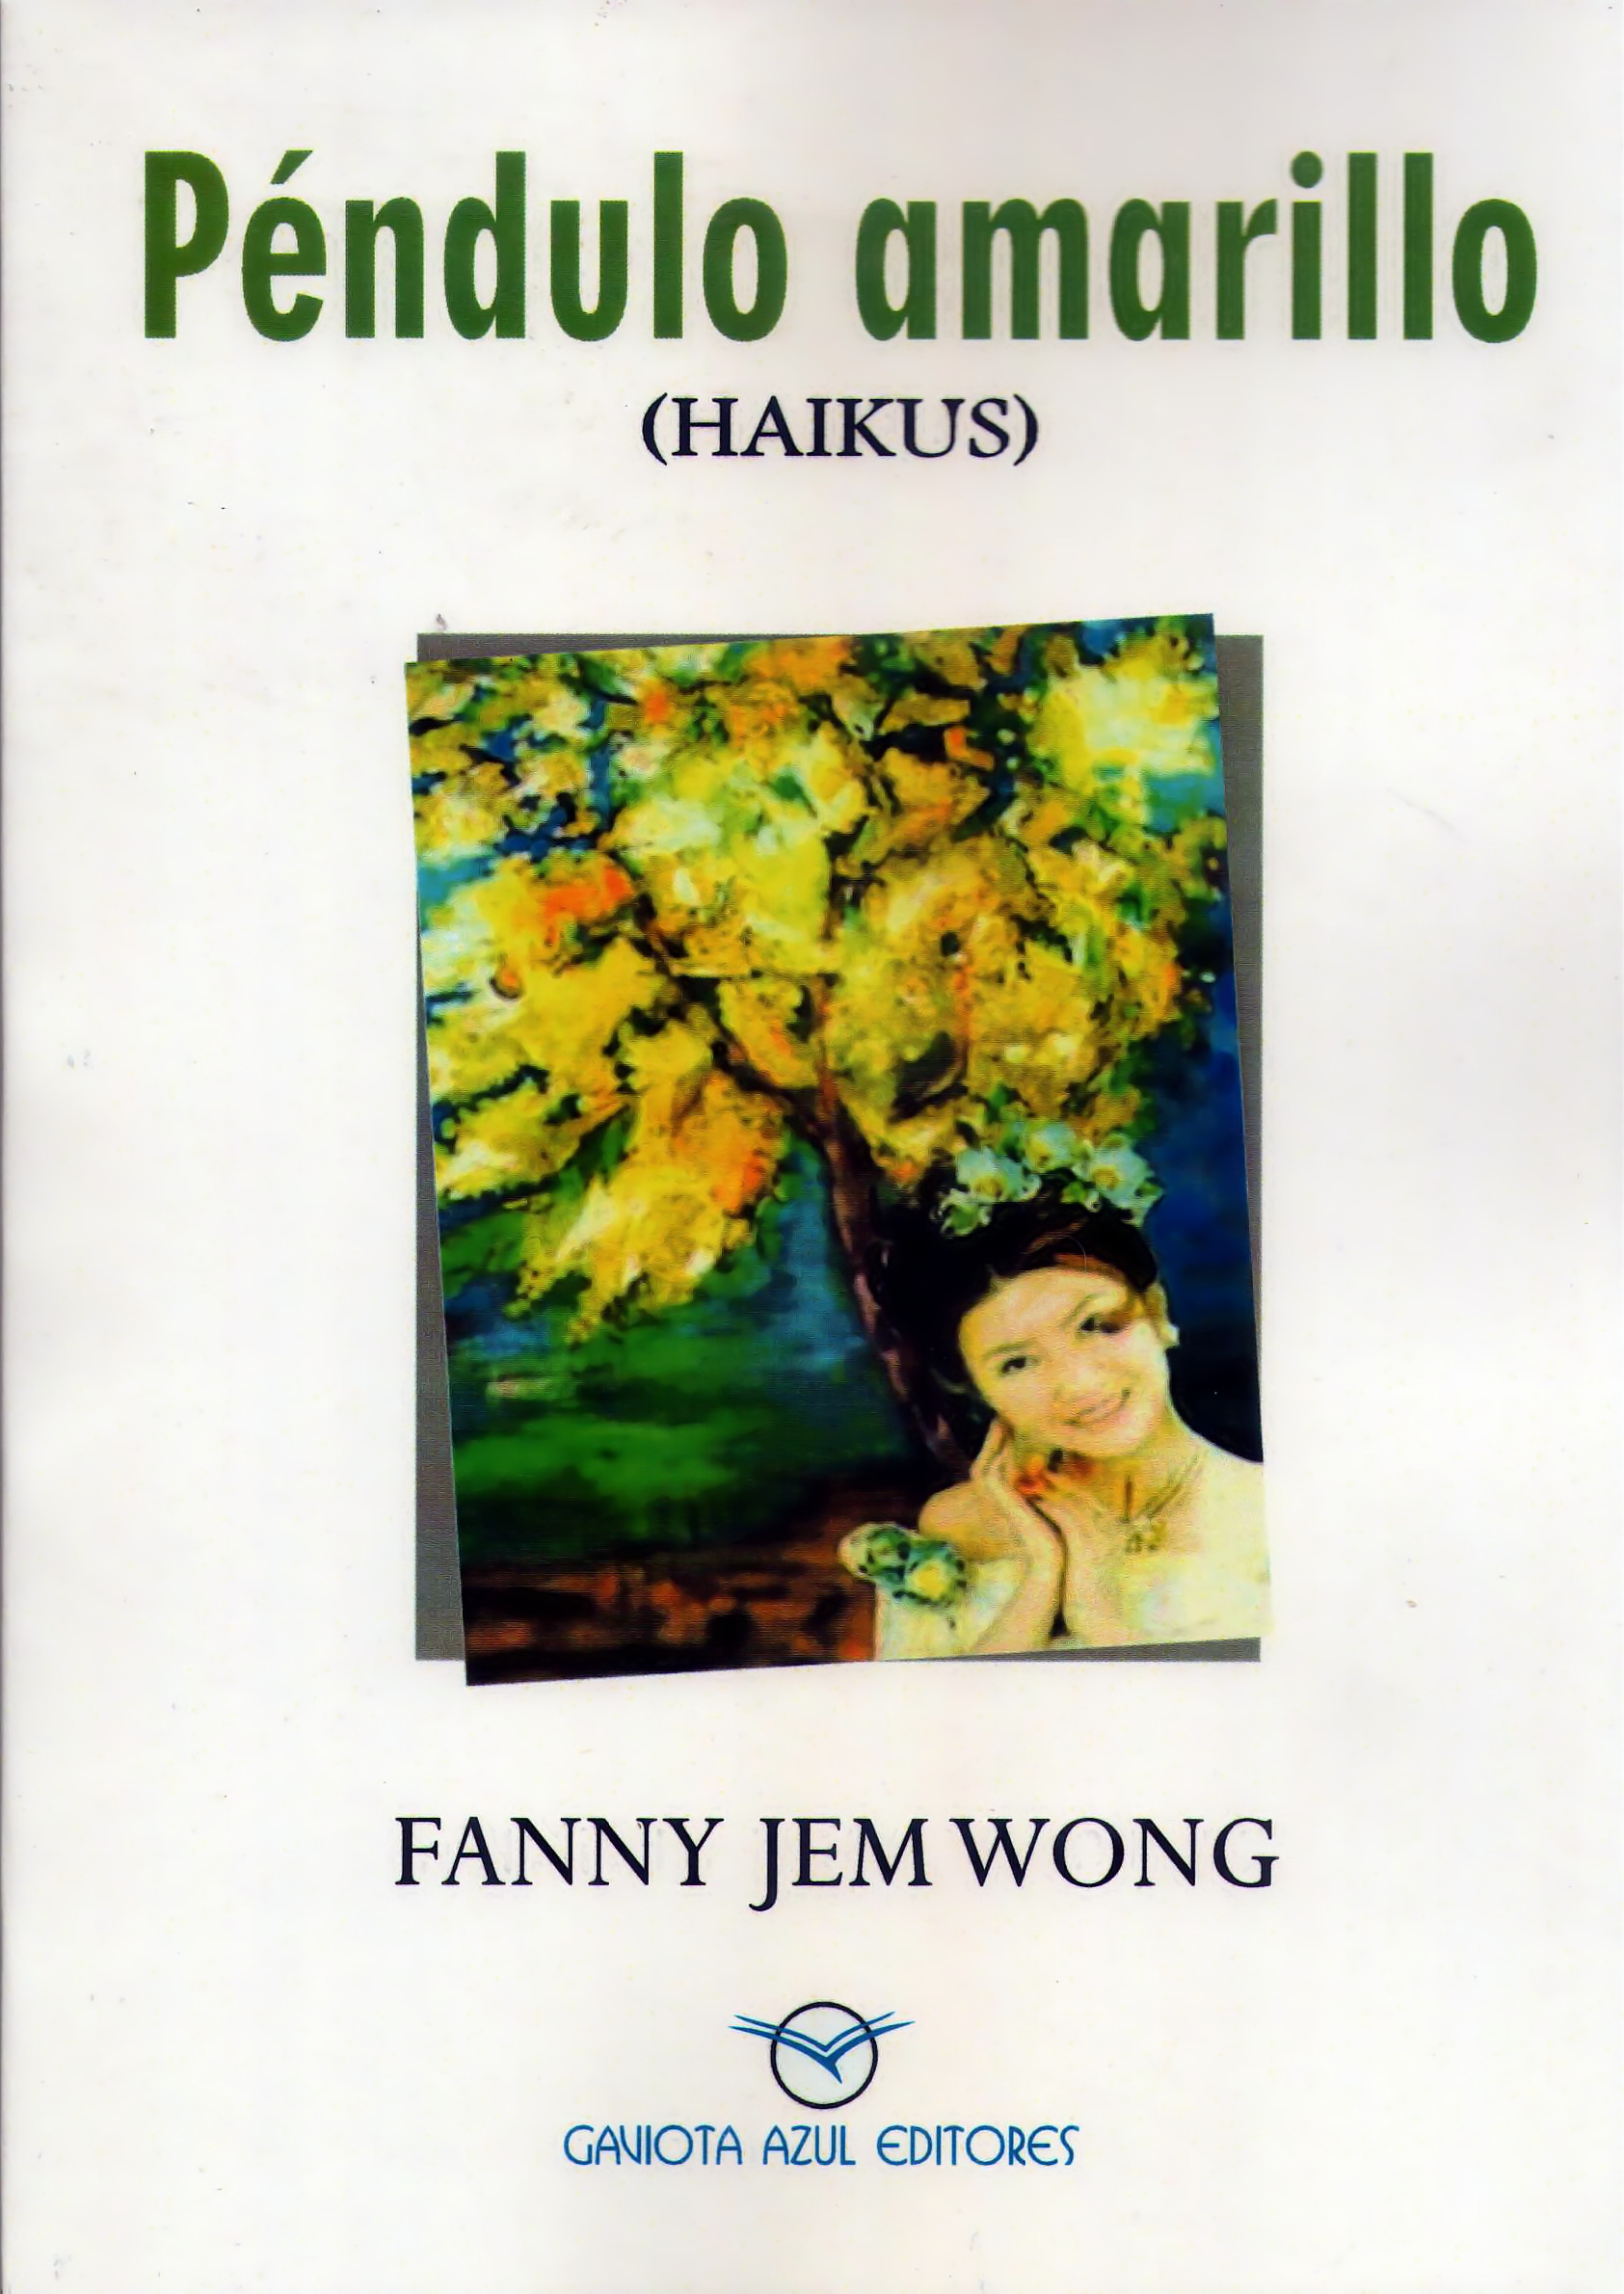 "WONG M, Fanny Jem (2019). ""PÉNDULO AMARILLO"" (HAIKUS). Gaviota Azul Editores. Lima. 123 págs. Depósito Legal Biblioteca Nacional del Perú: REG Nº 2019-12337. ISBN:978-612-46663-7-7"